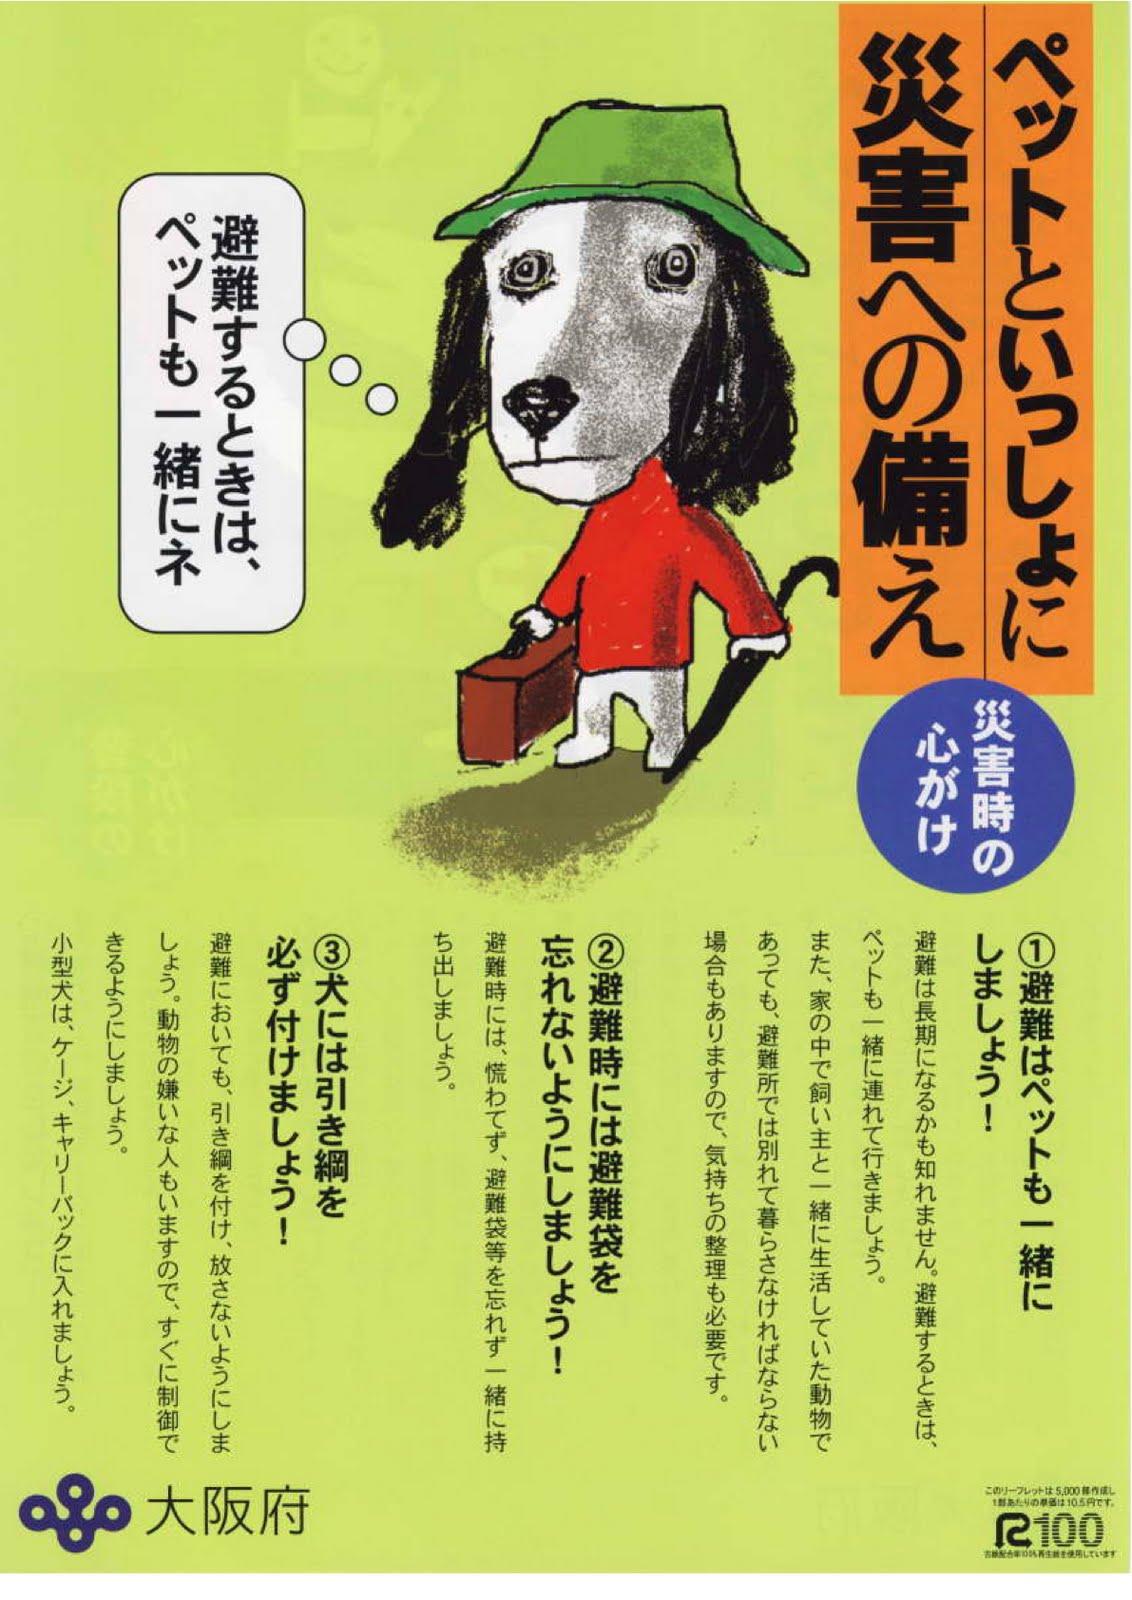 ppsakahu-saigai-p1.jpg